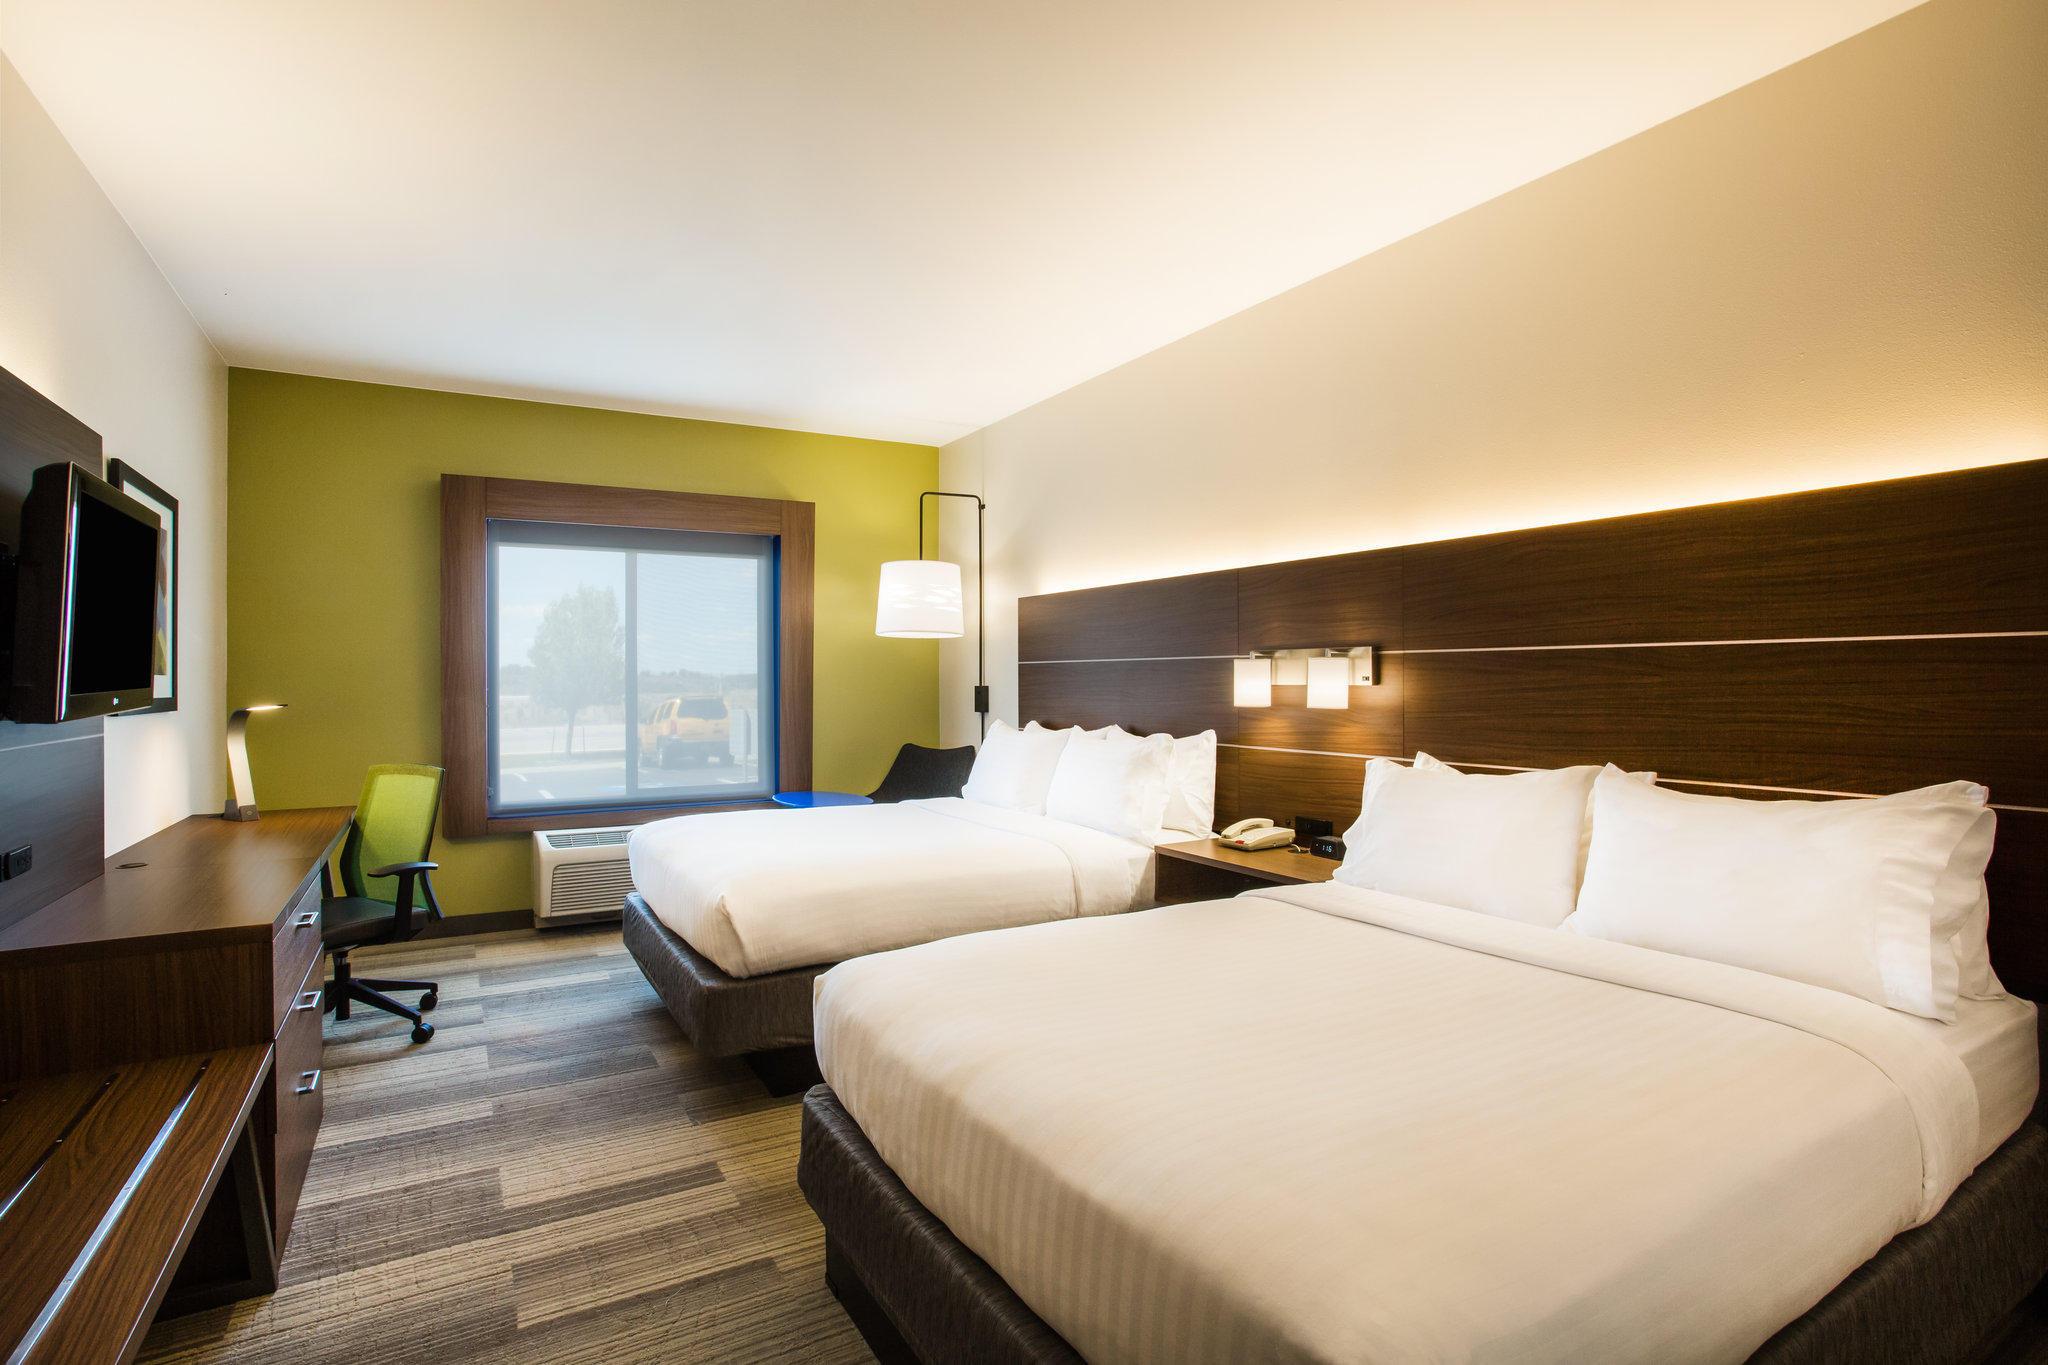 Holiday Inn Express & Suites Cedar City